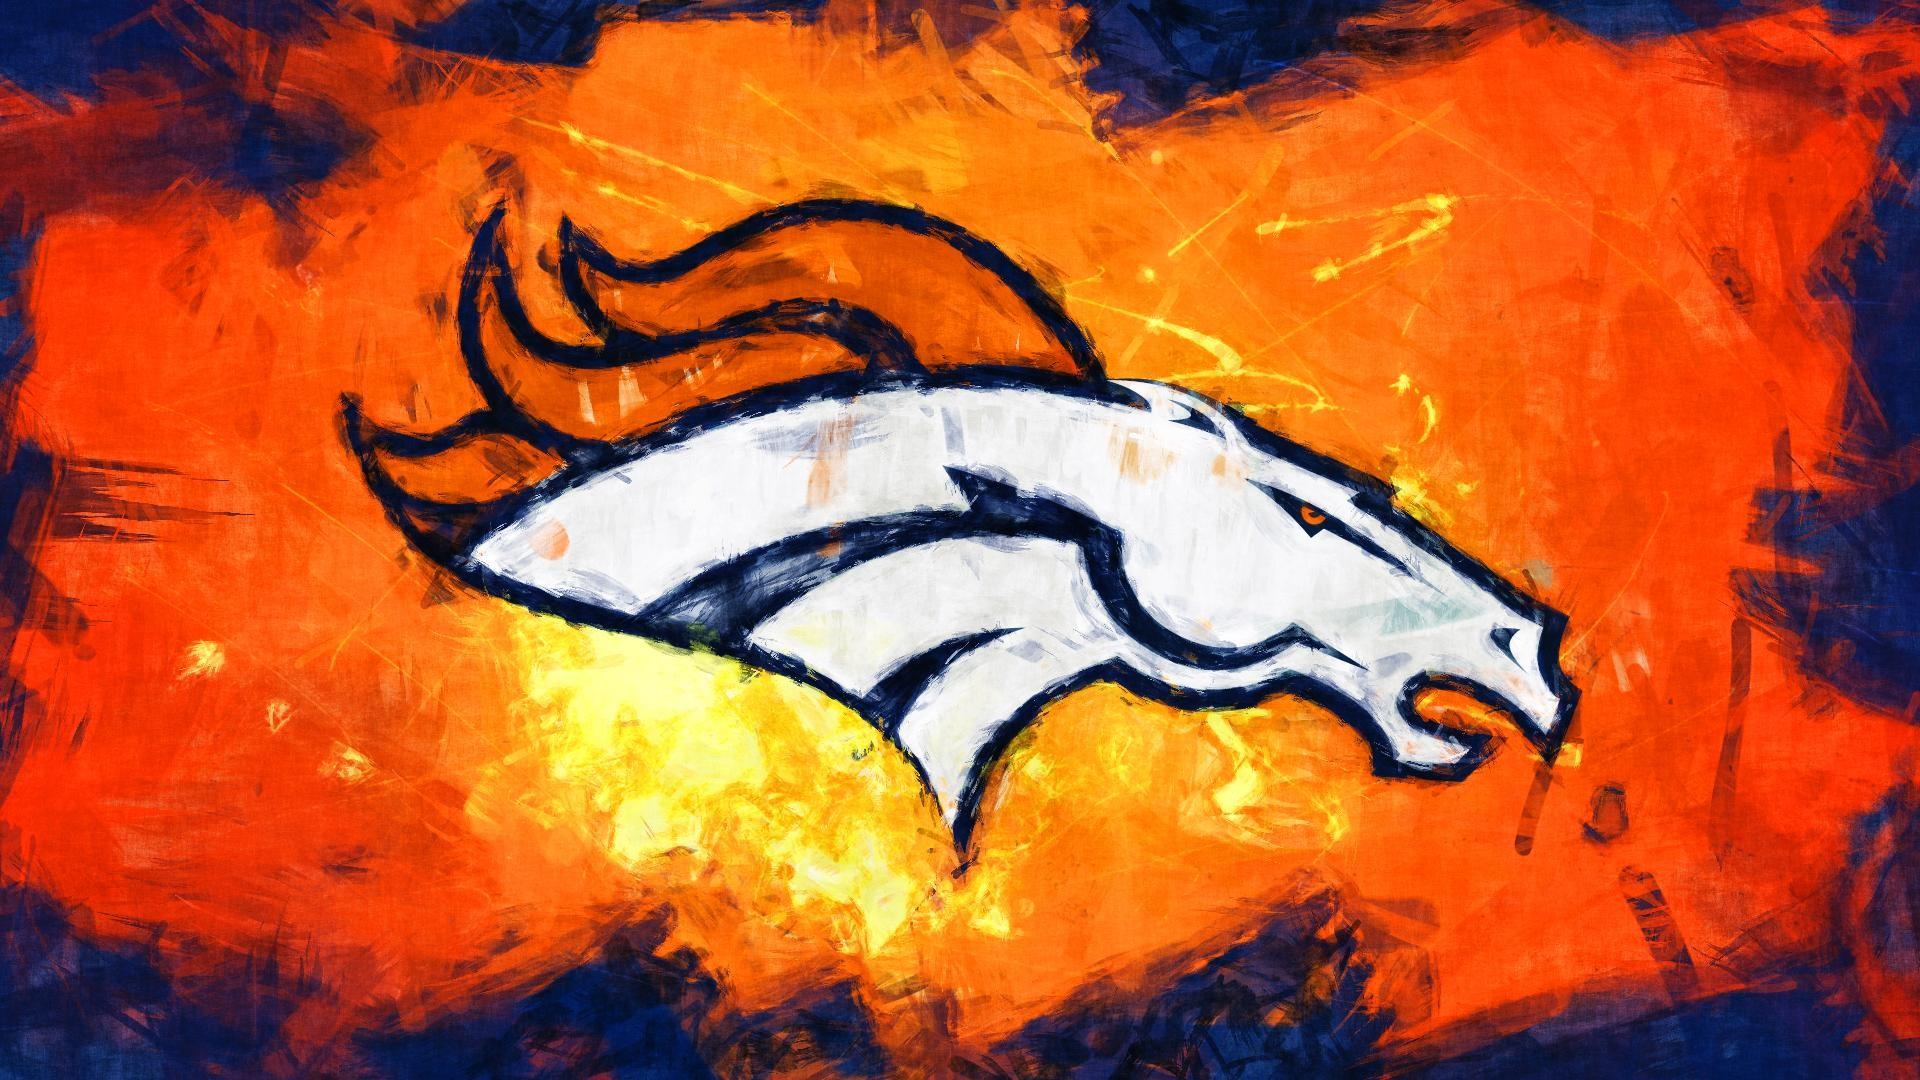 Denver Broncos Wallpapers Images Photos Pictures Backgrounds 1920×1080 Denver  Broncos Wallpaper (49 Wallpapers